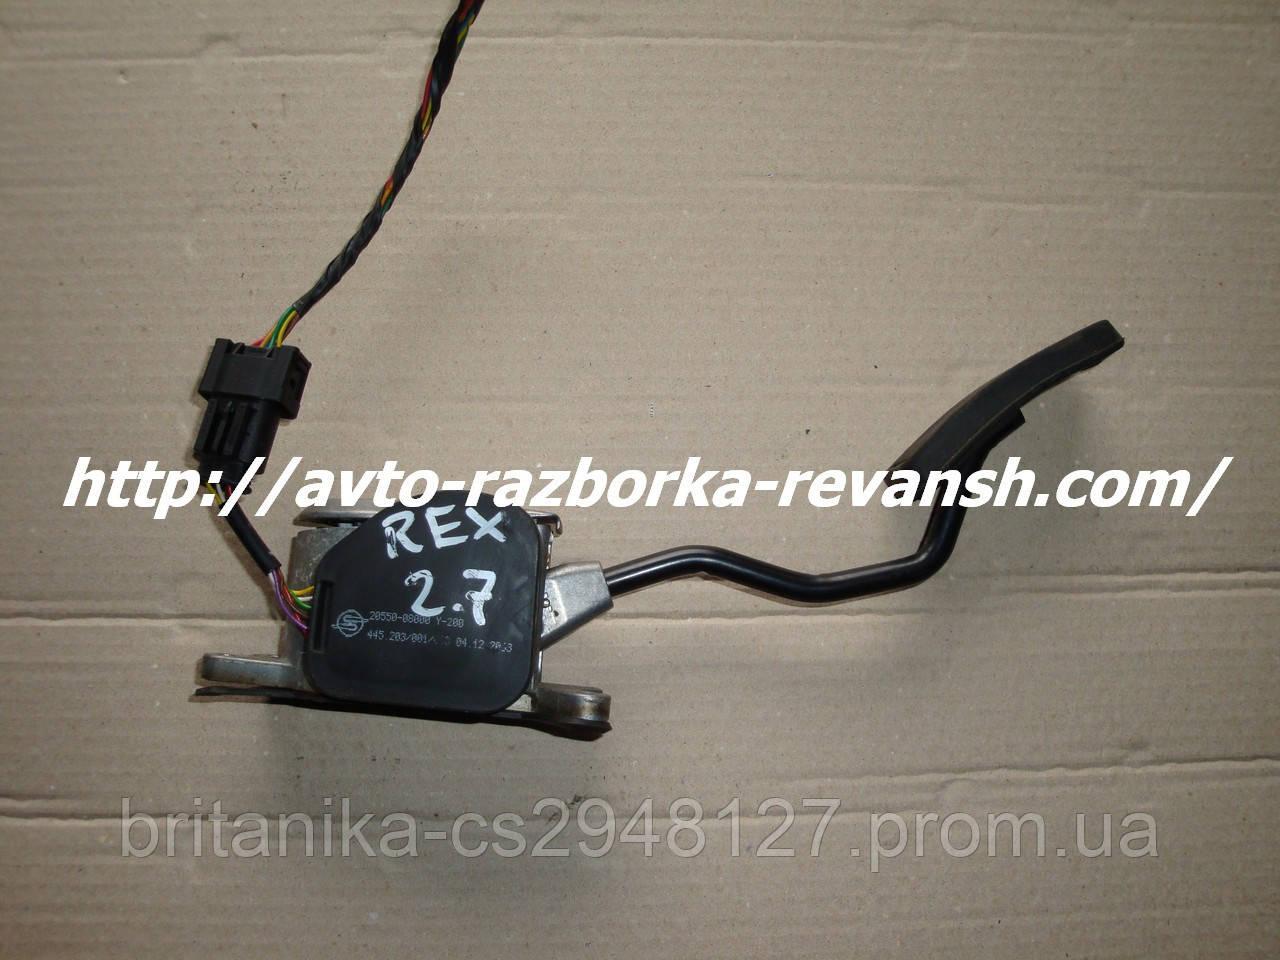 Педаль газа электронная SsangYoung Rexton 2.7xdi 6889993833/2055008000 бу